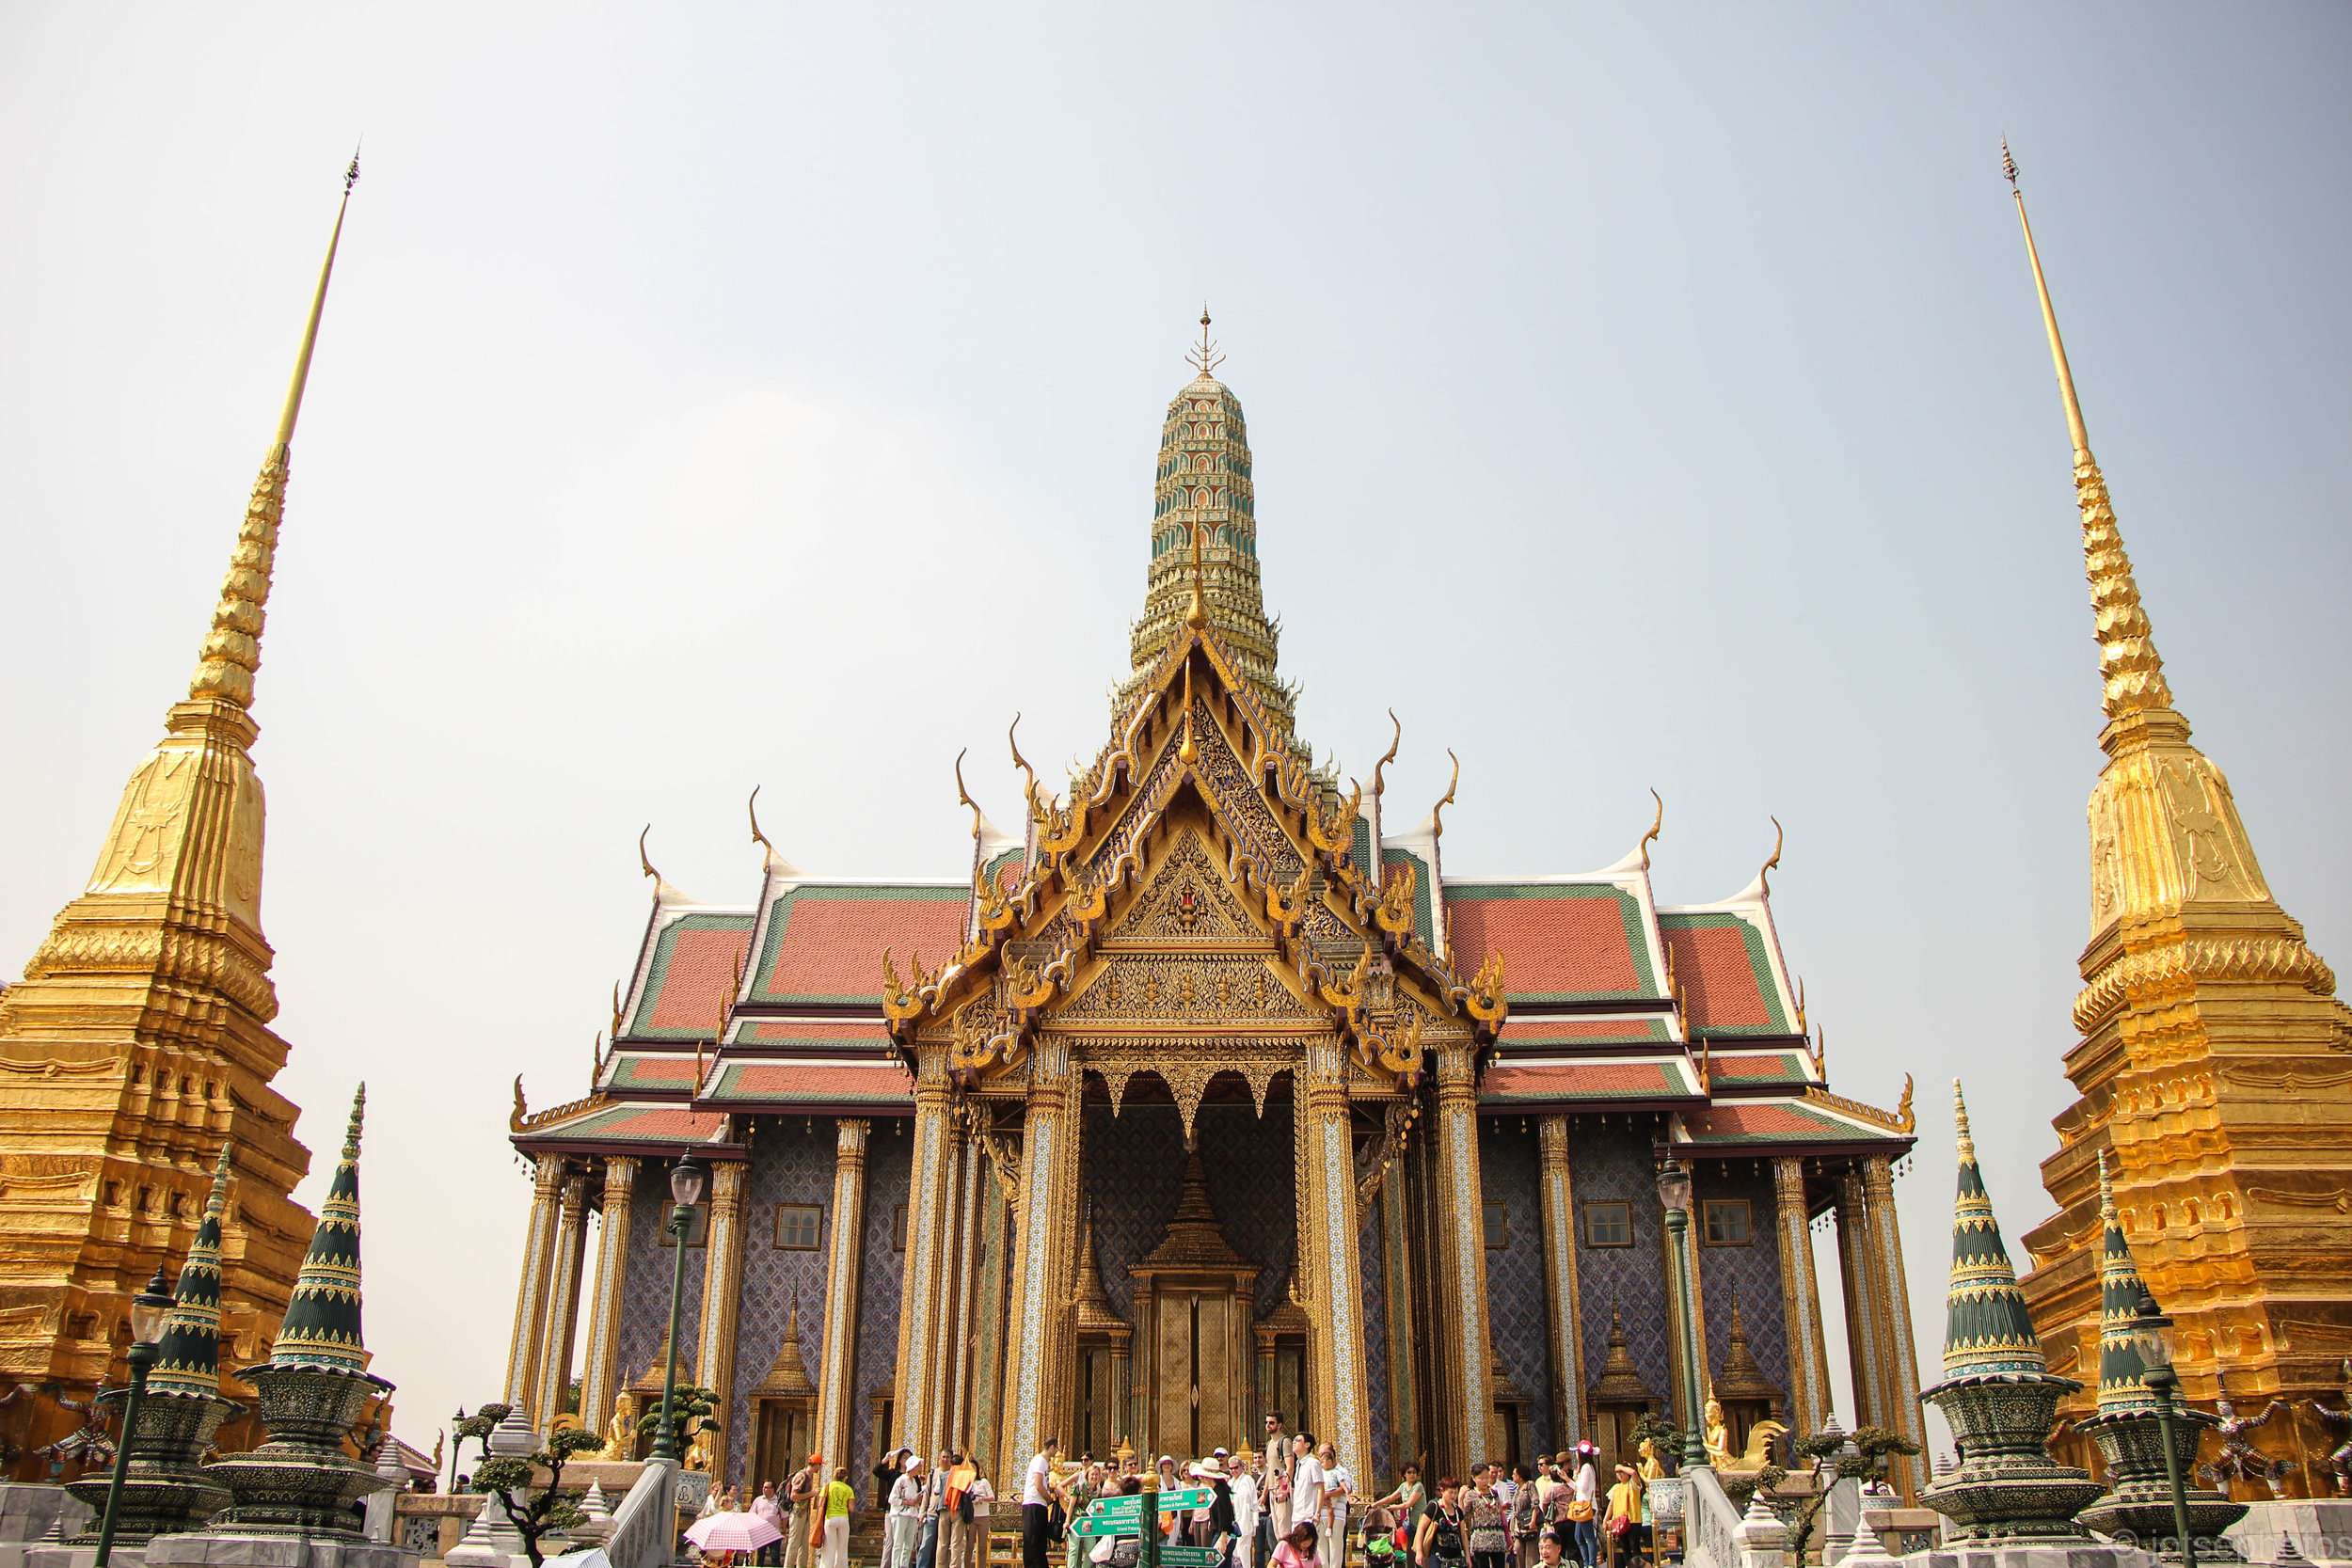 grand-palace_11916259696_o.jpg